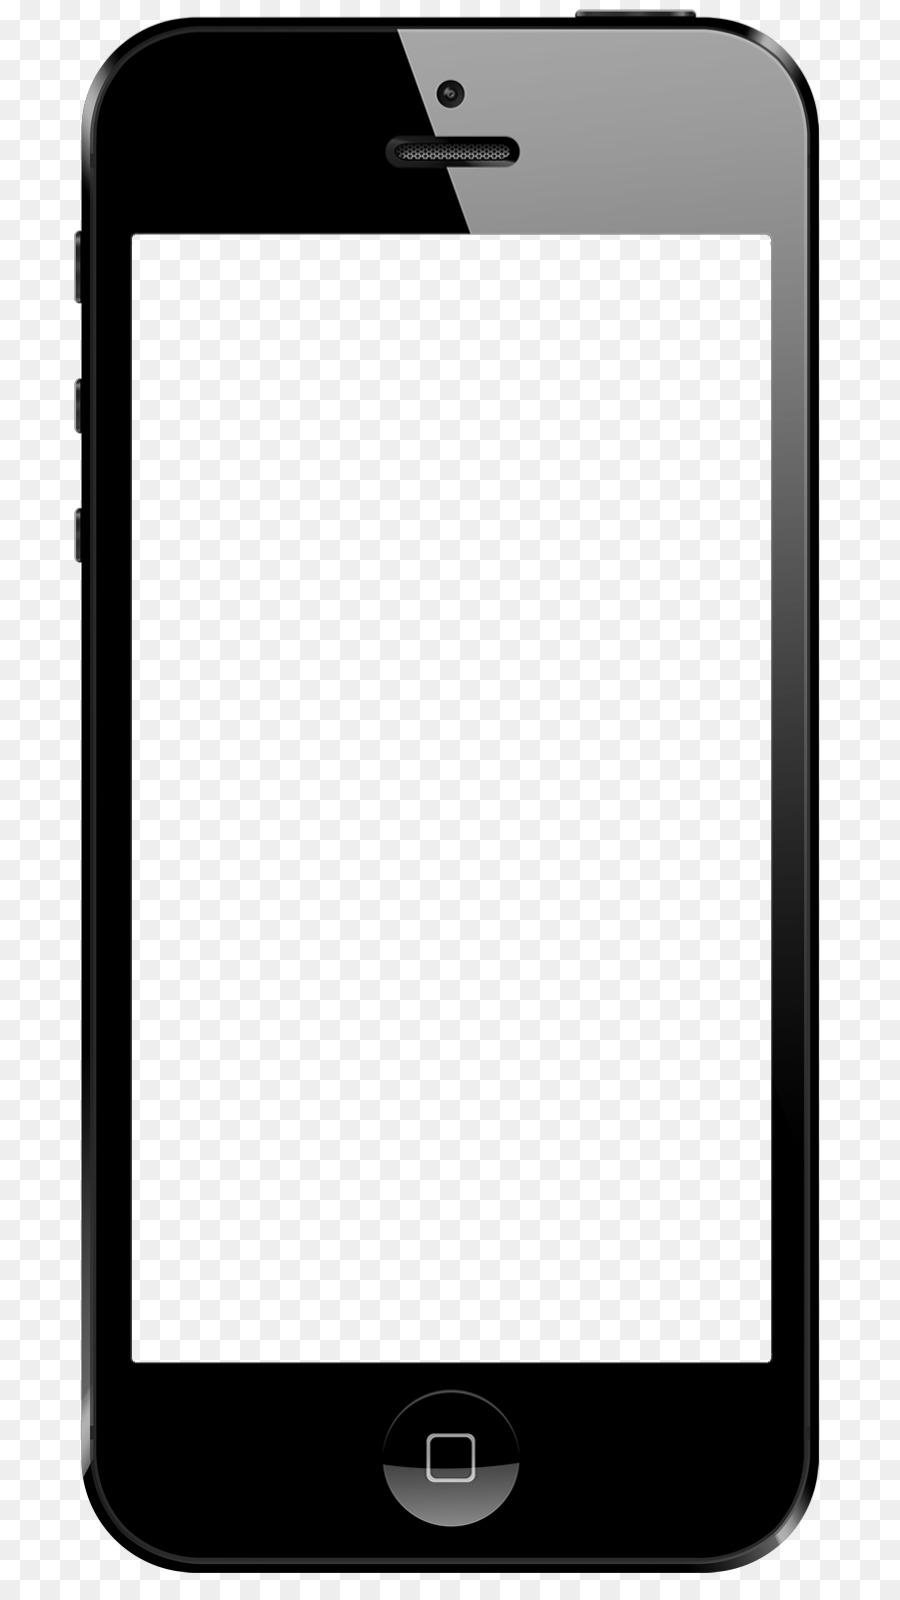 Android Phone Clipart Smartphone Iphone Black Transparent Clip Art